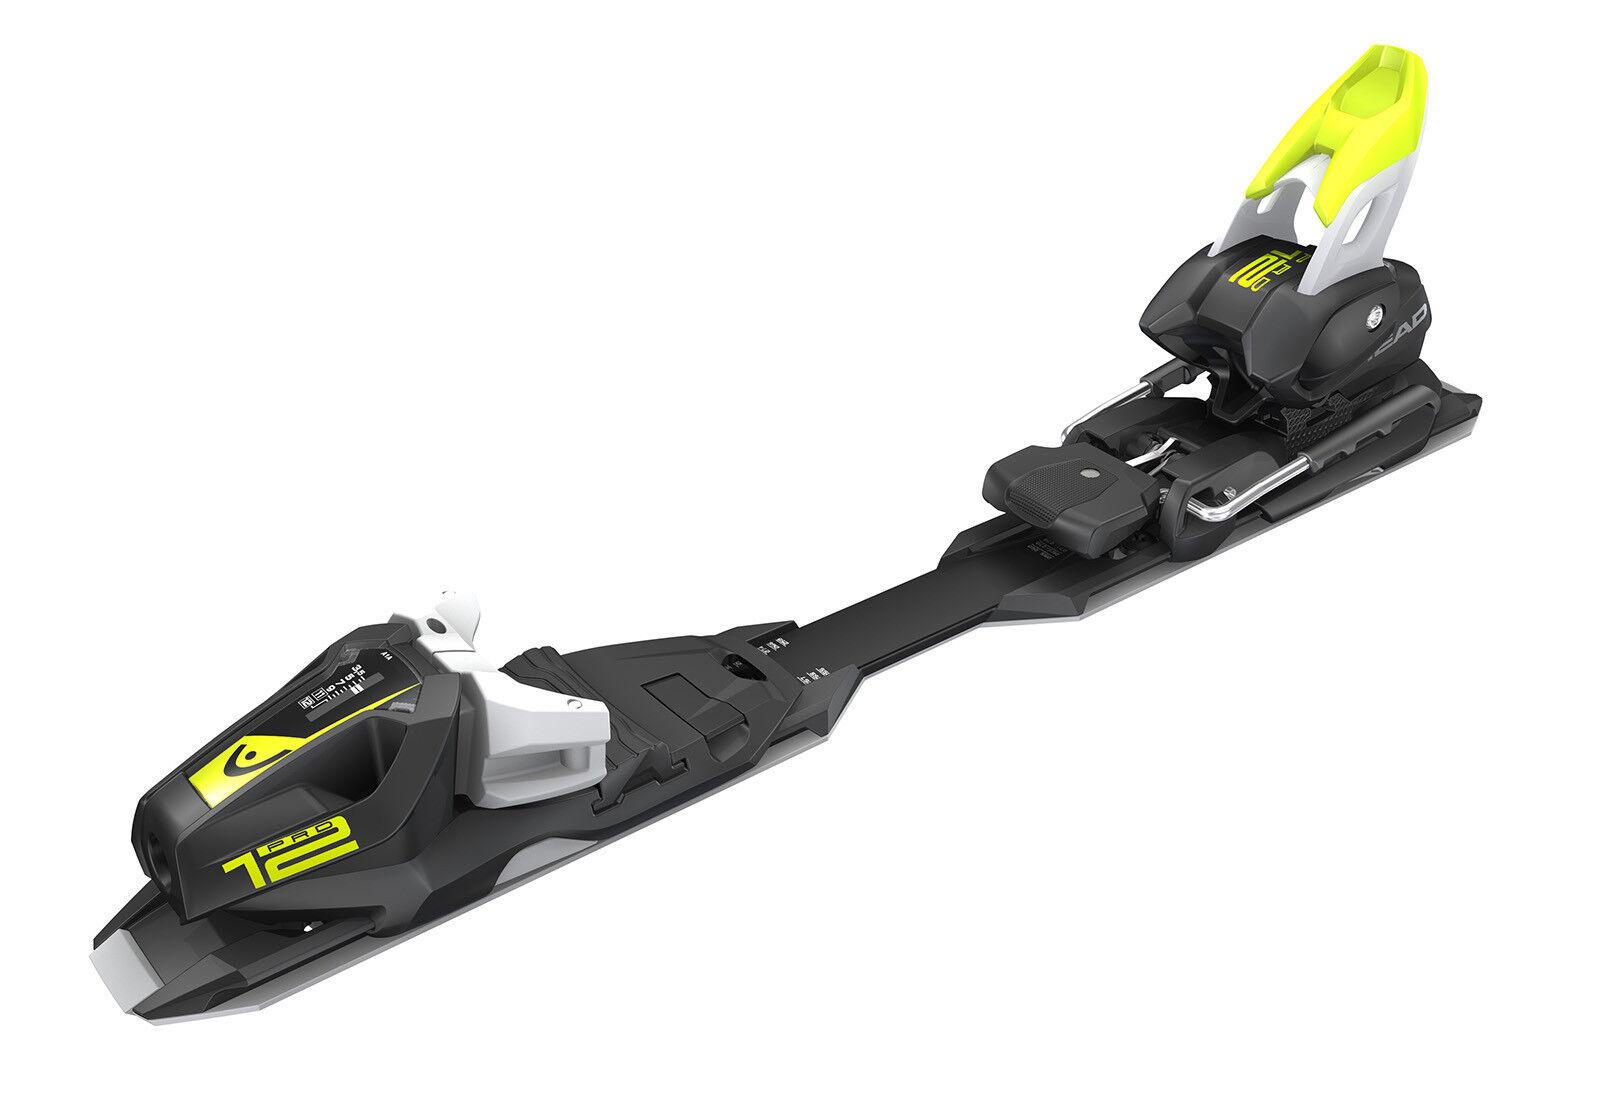 HEAD Supershape i.SPEED SW SW SW mit PRD 12 GW Bindung Race Carver Ski Collection 2019 c13b1b